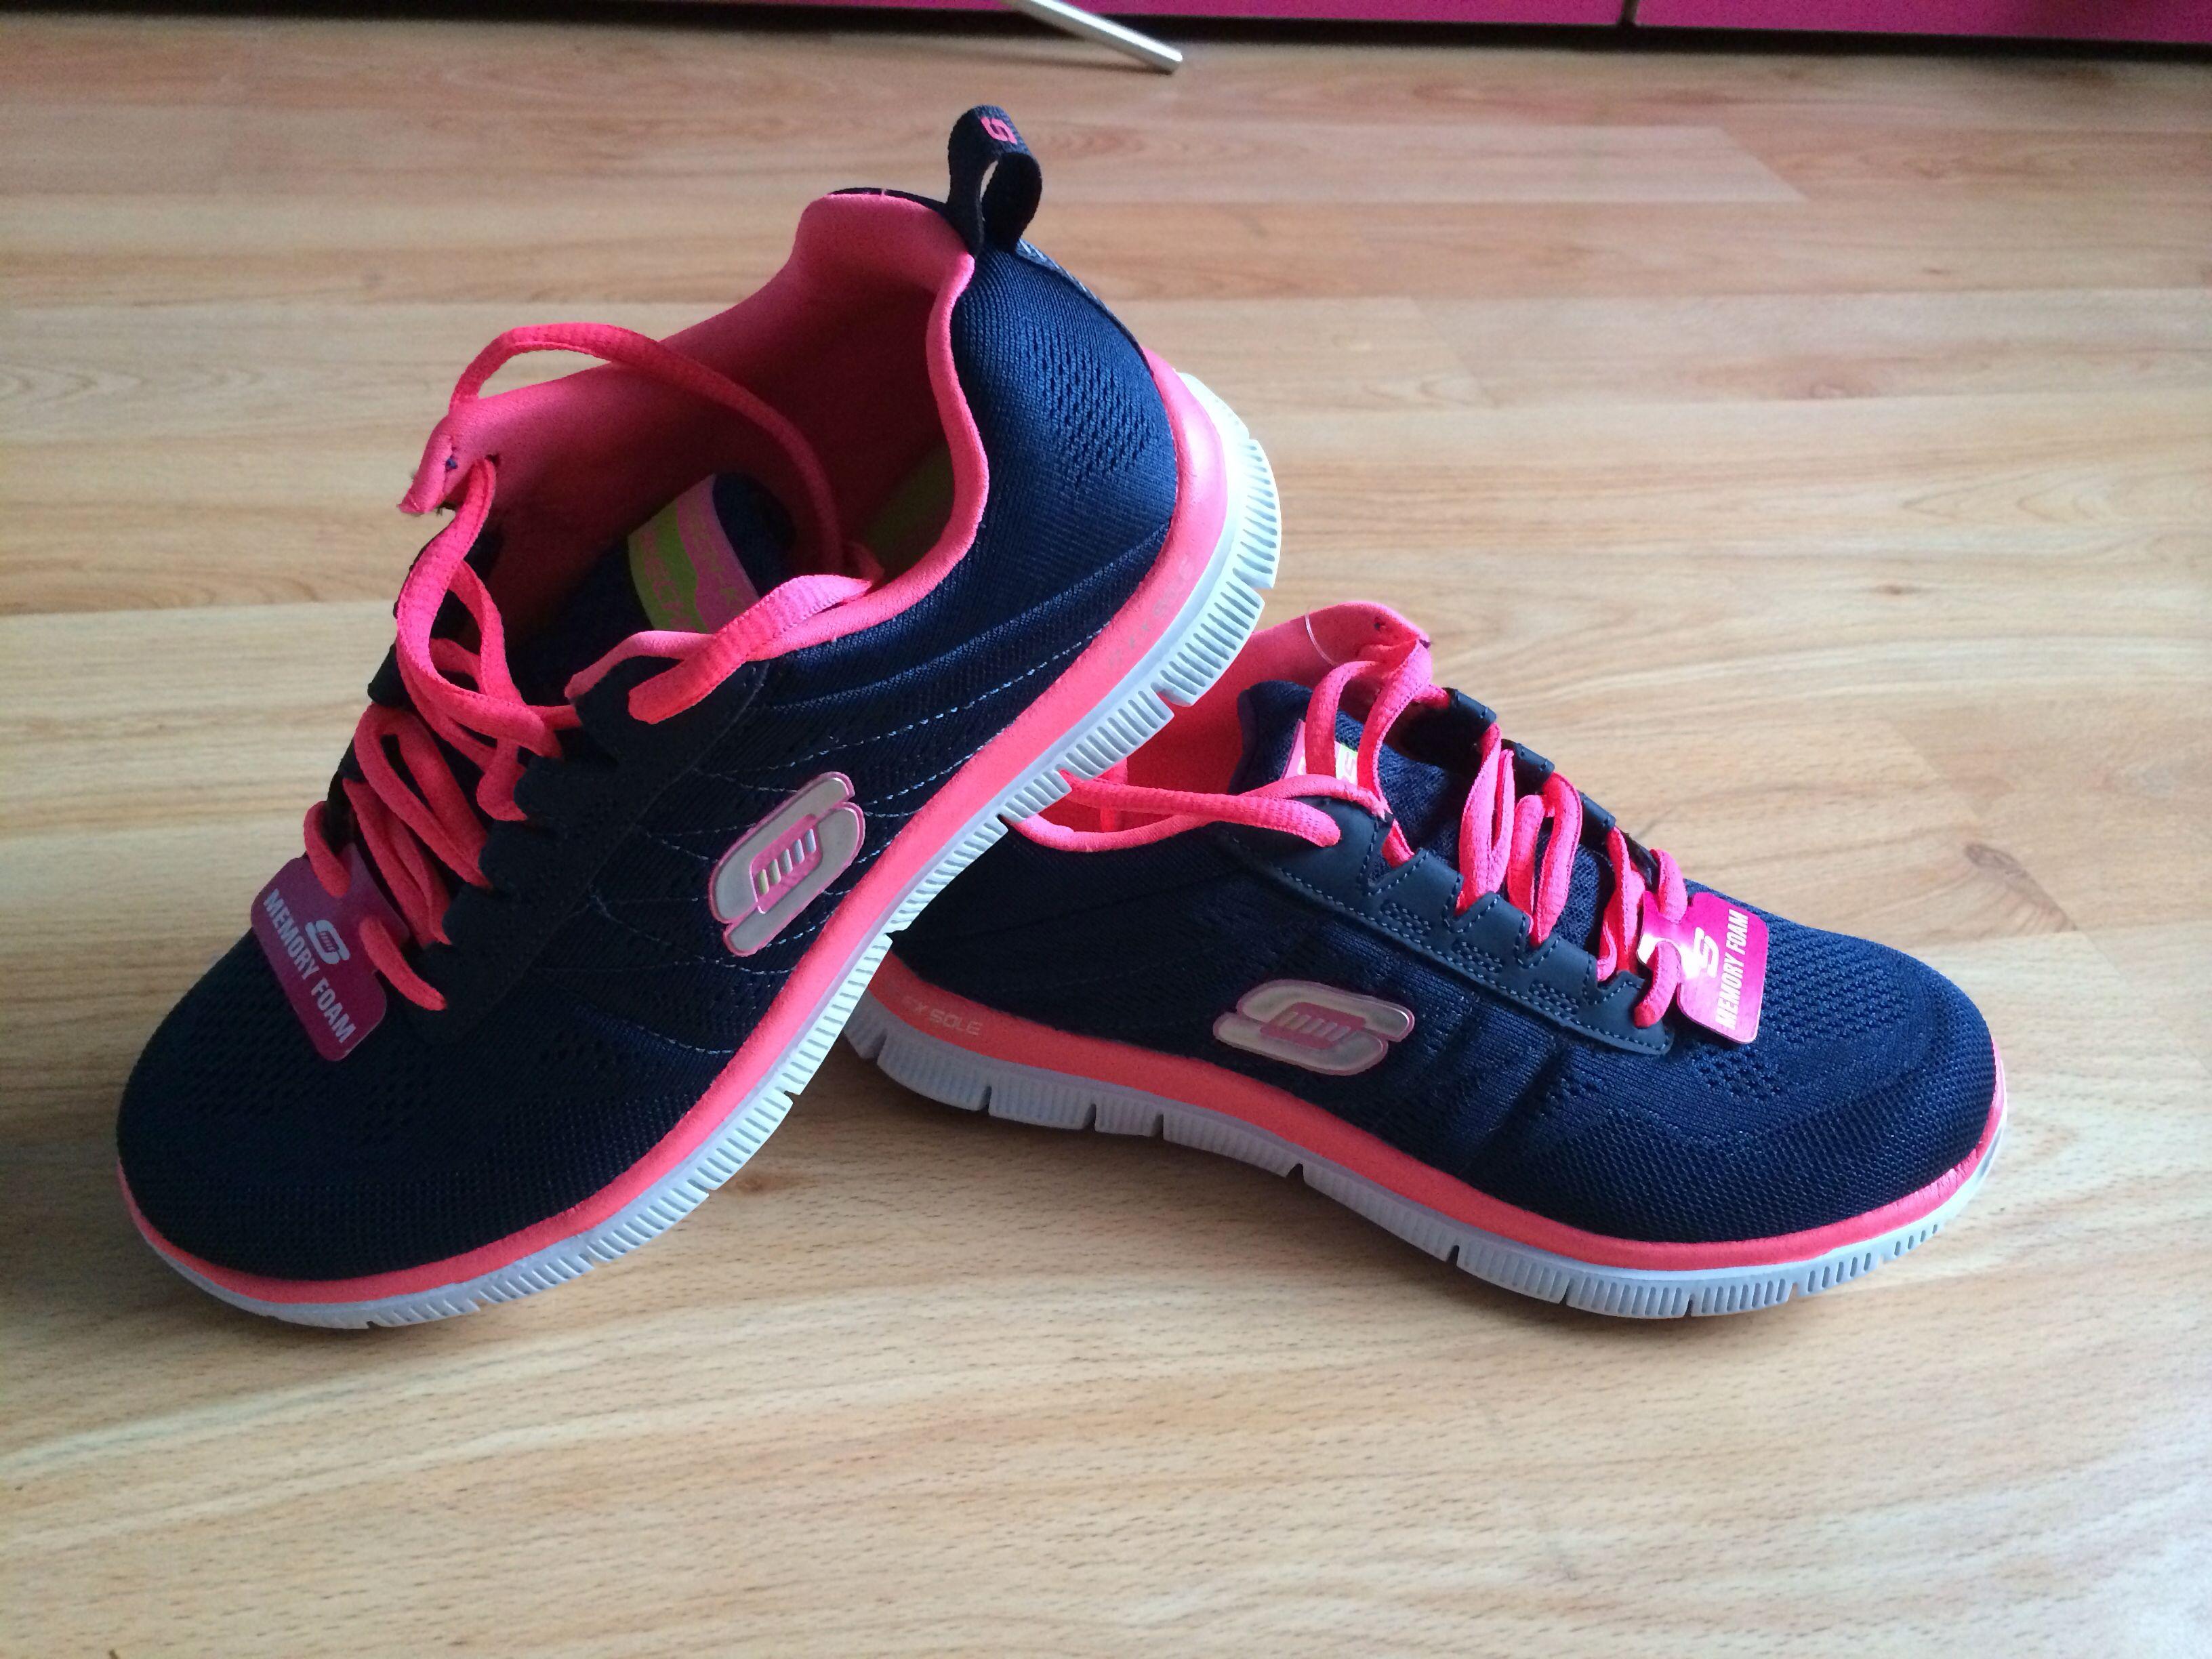 vestíbulo pegatina mamífero  My new babies! Memory foam make them sooooo comfortable - Skechers Flex  Appeal with Memory Foam | Zapatos, Tenis